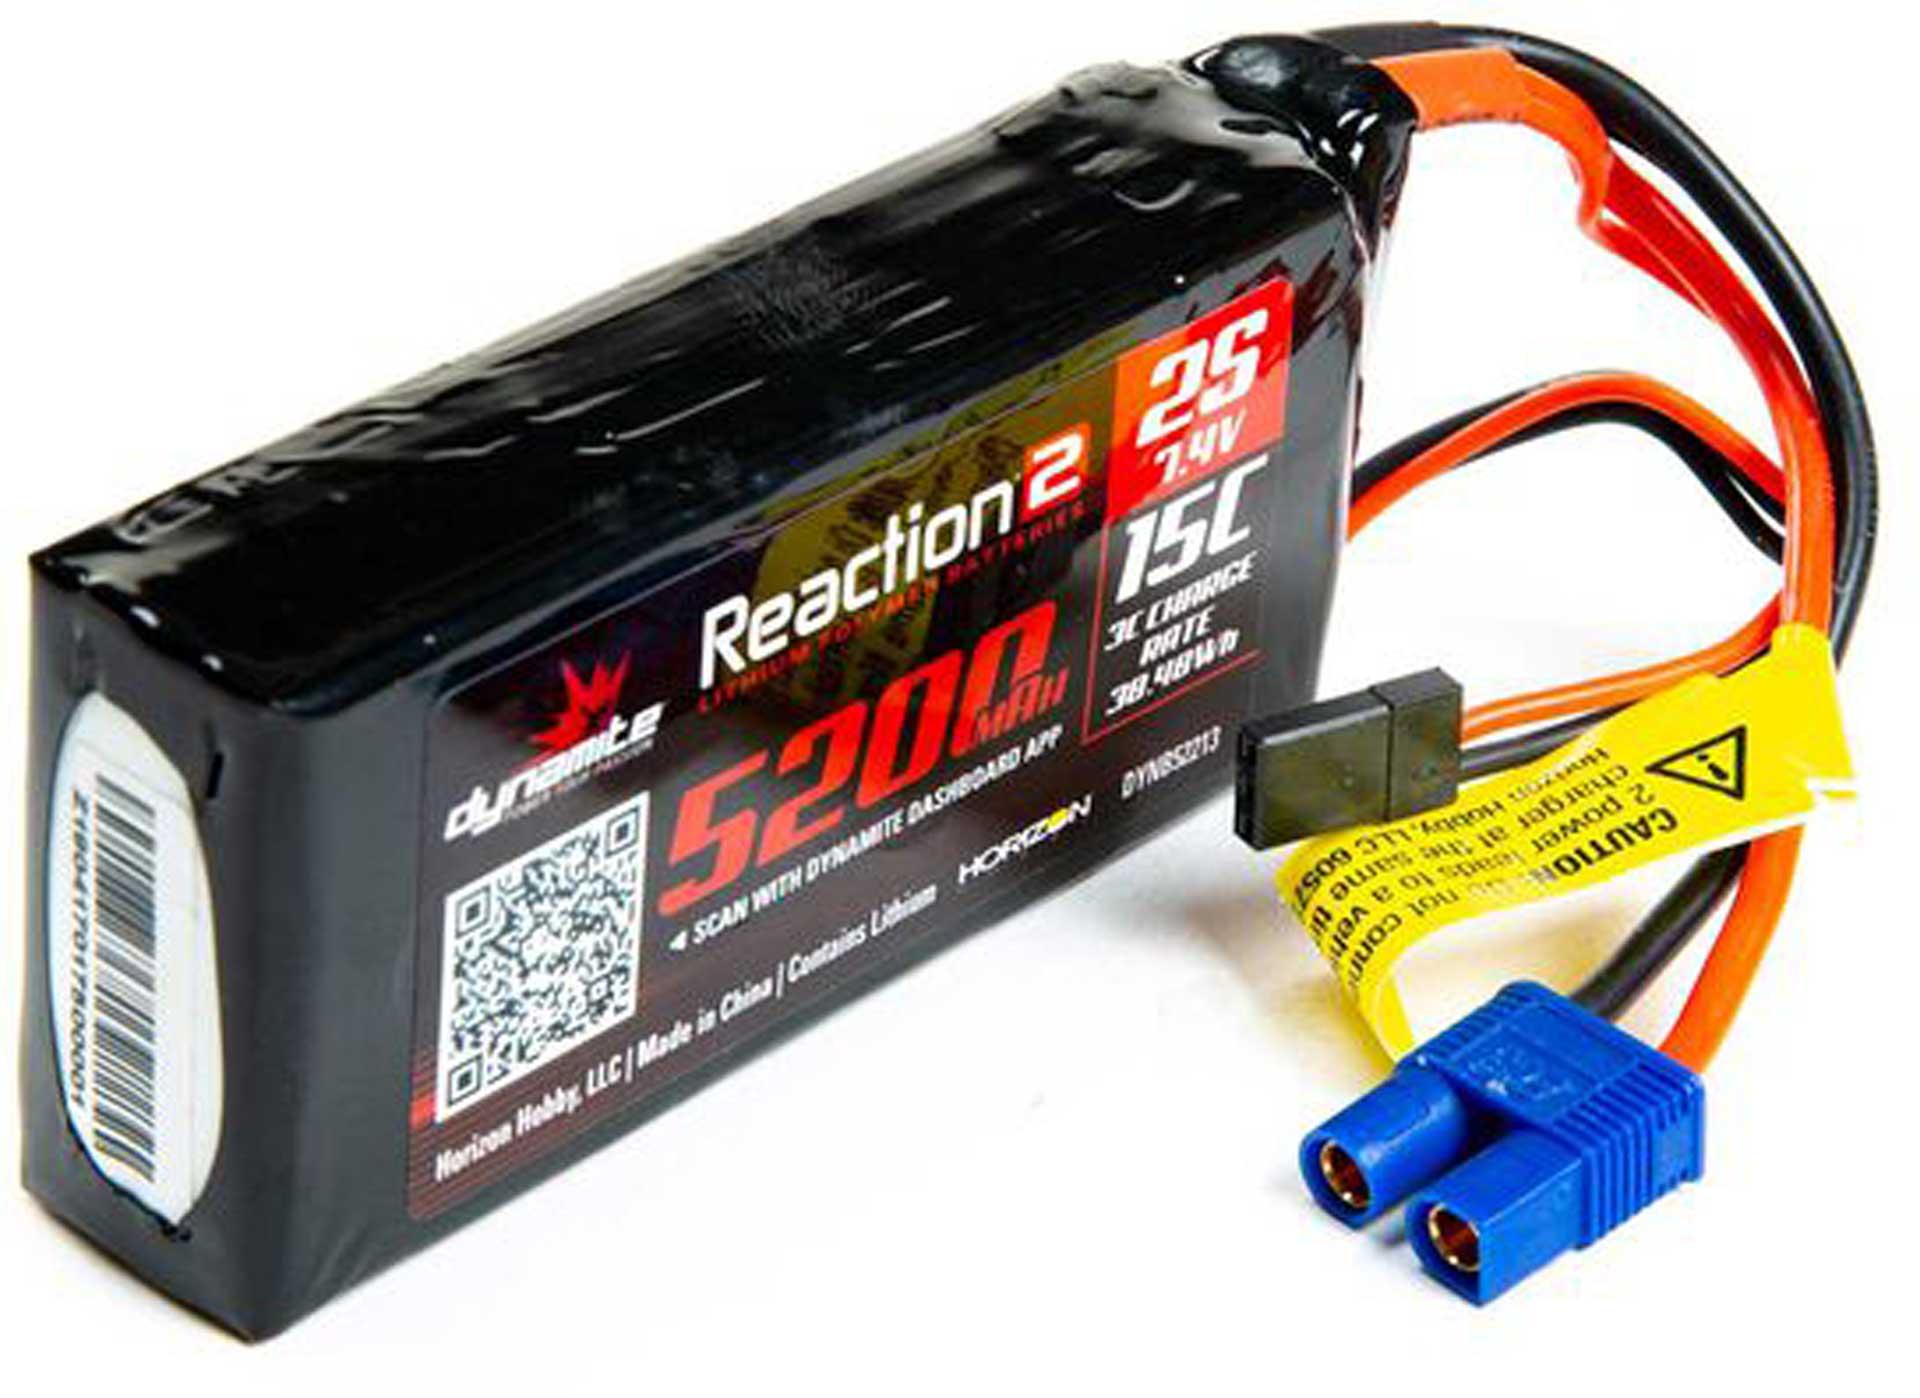 DYNAMITE 7.4V 5200mAh 2S 15C Reaction 2.0 LiPo Battery